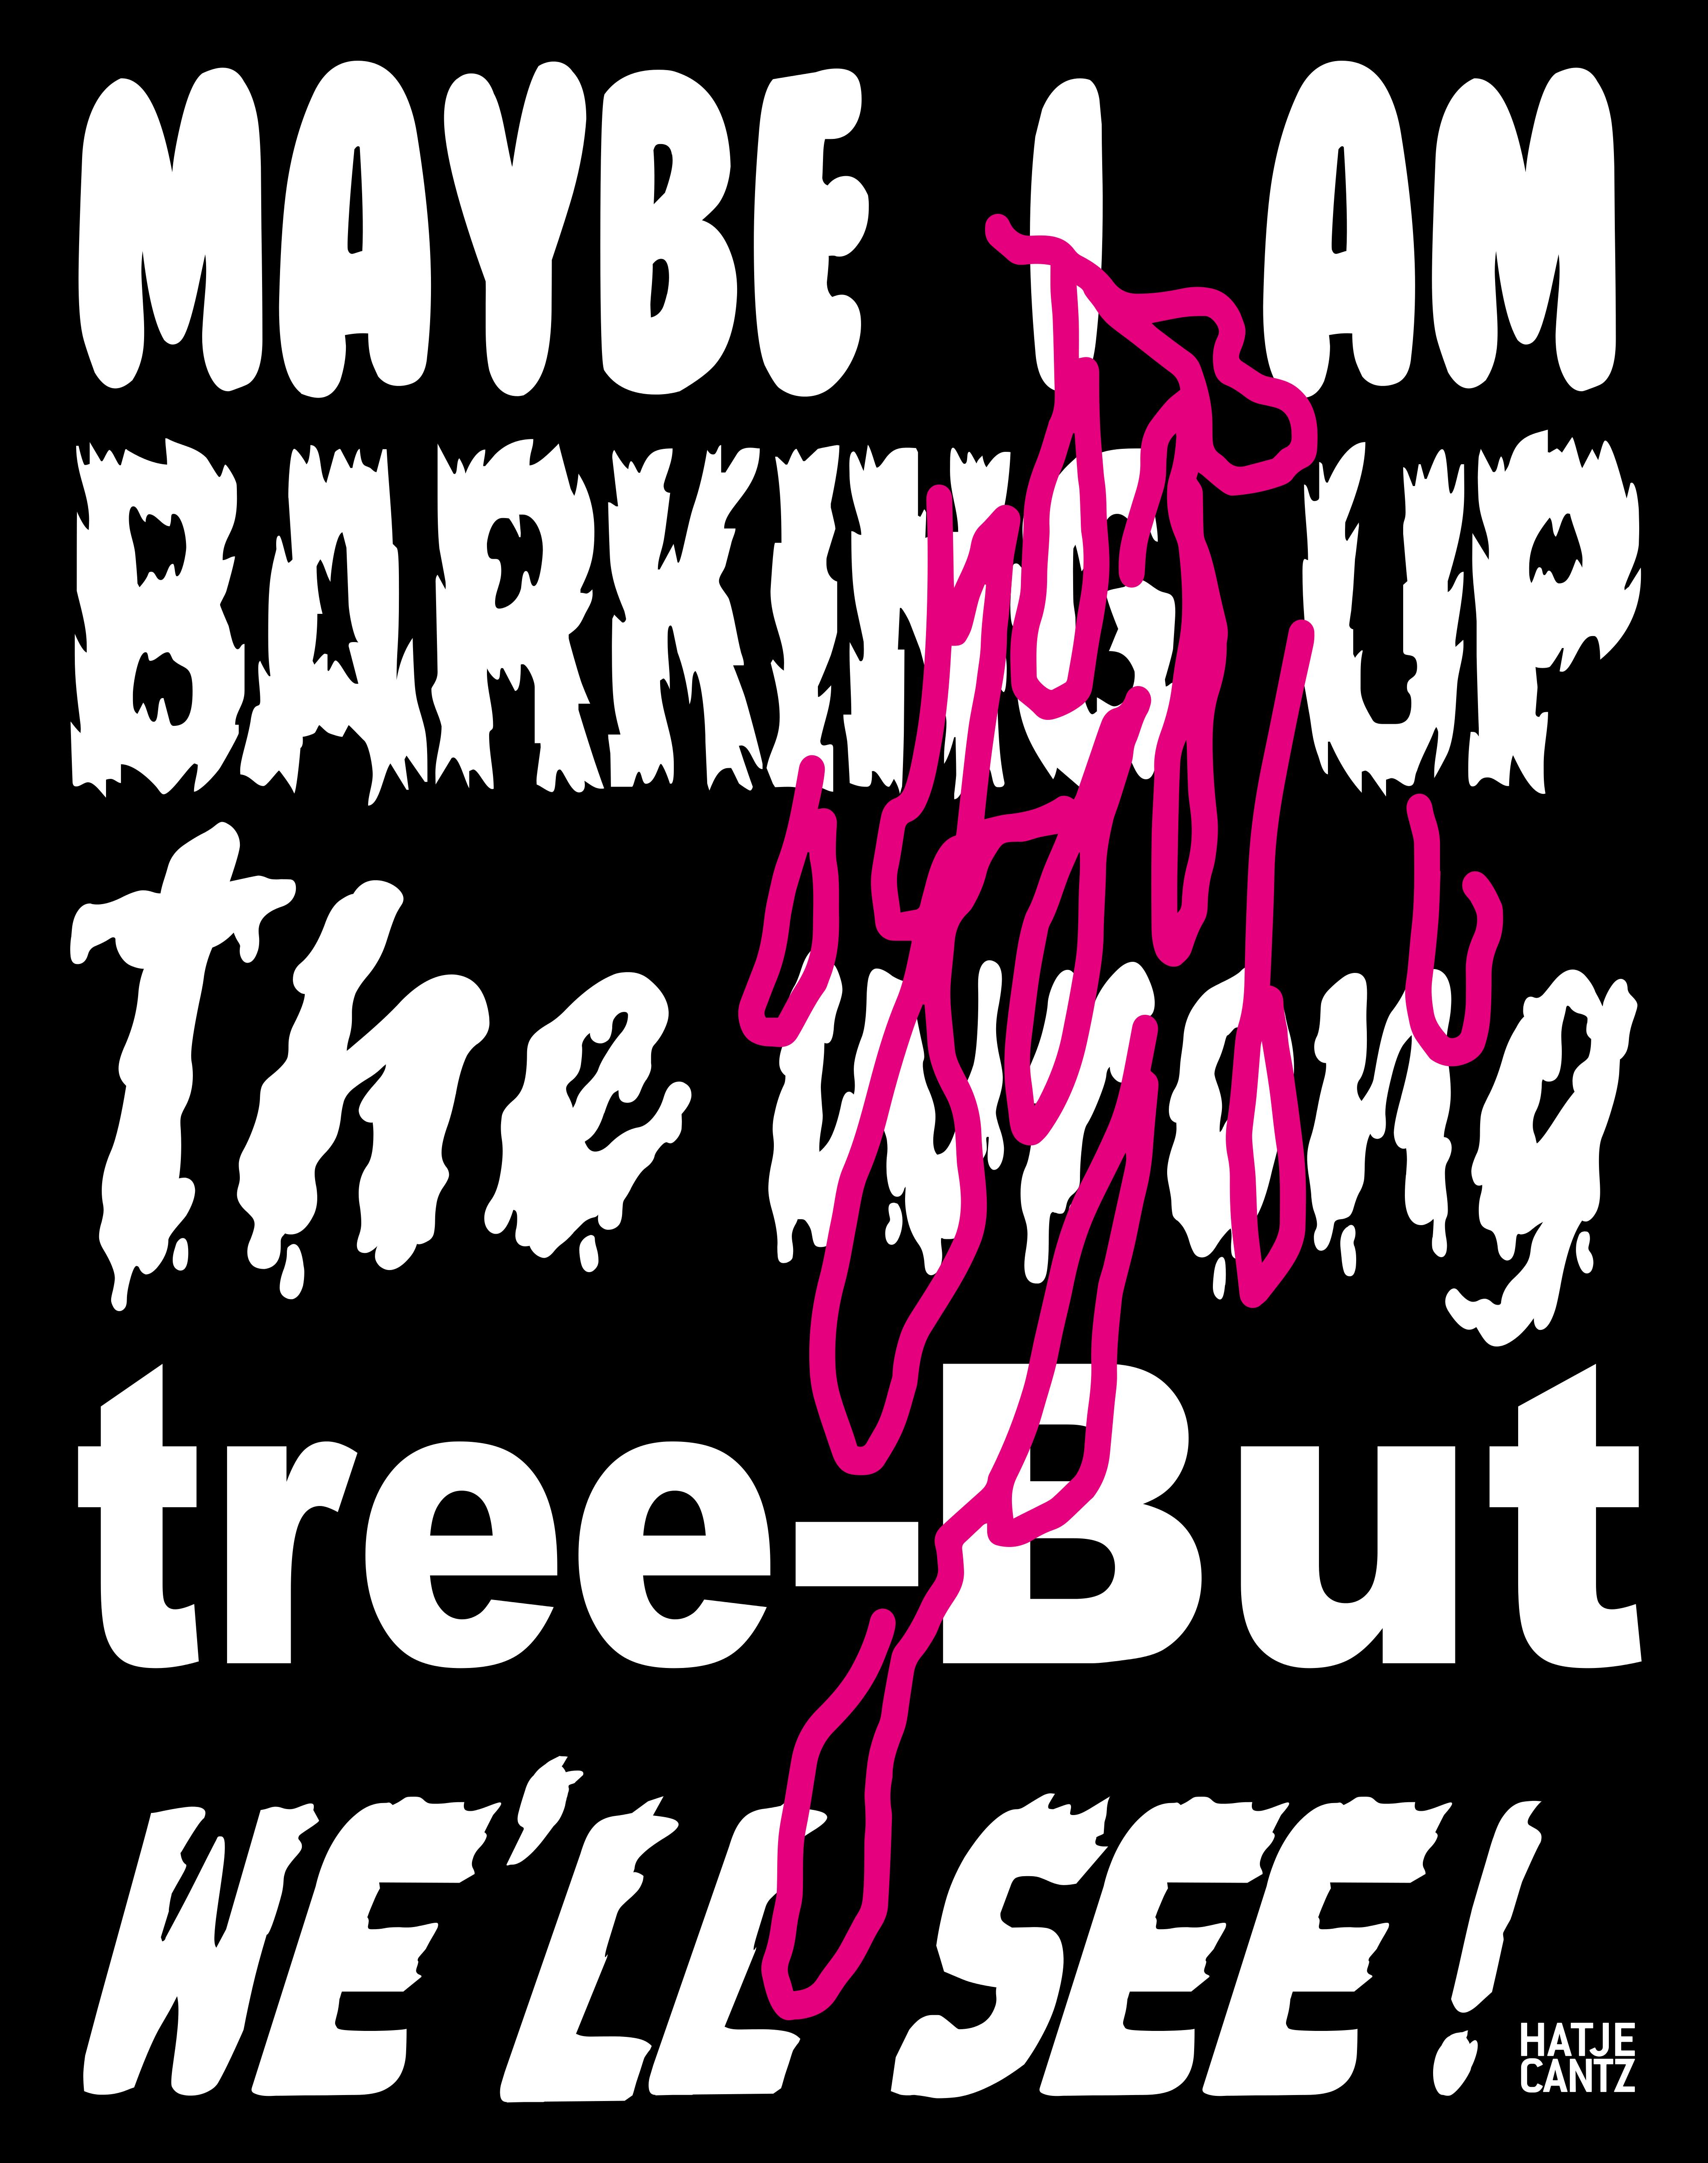 Katalogtitel Lukas Glinkowski   Maybe I Am Barking Up The Wrong Tree - But We'll See!